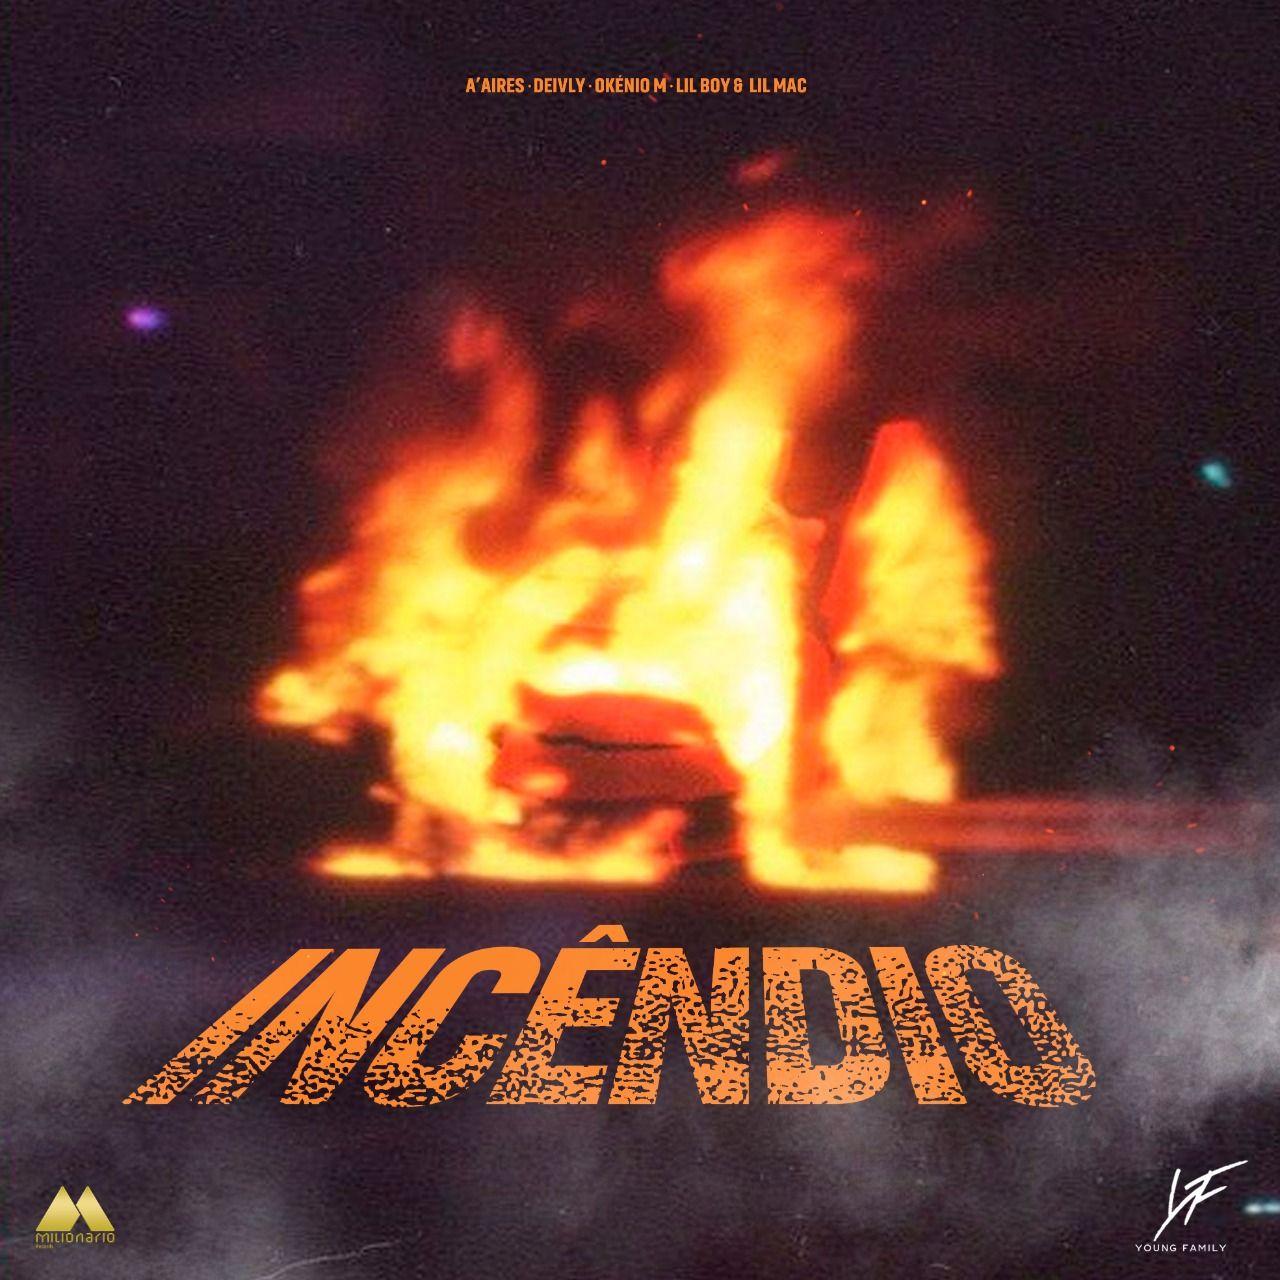 Young Family - Incêndio (Rap) 2021